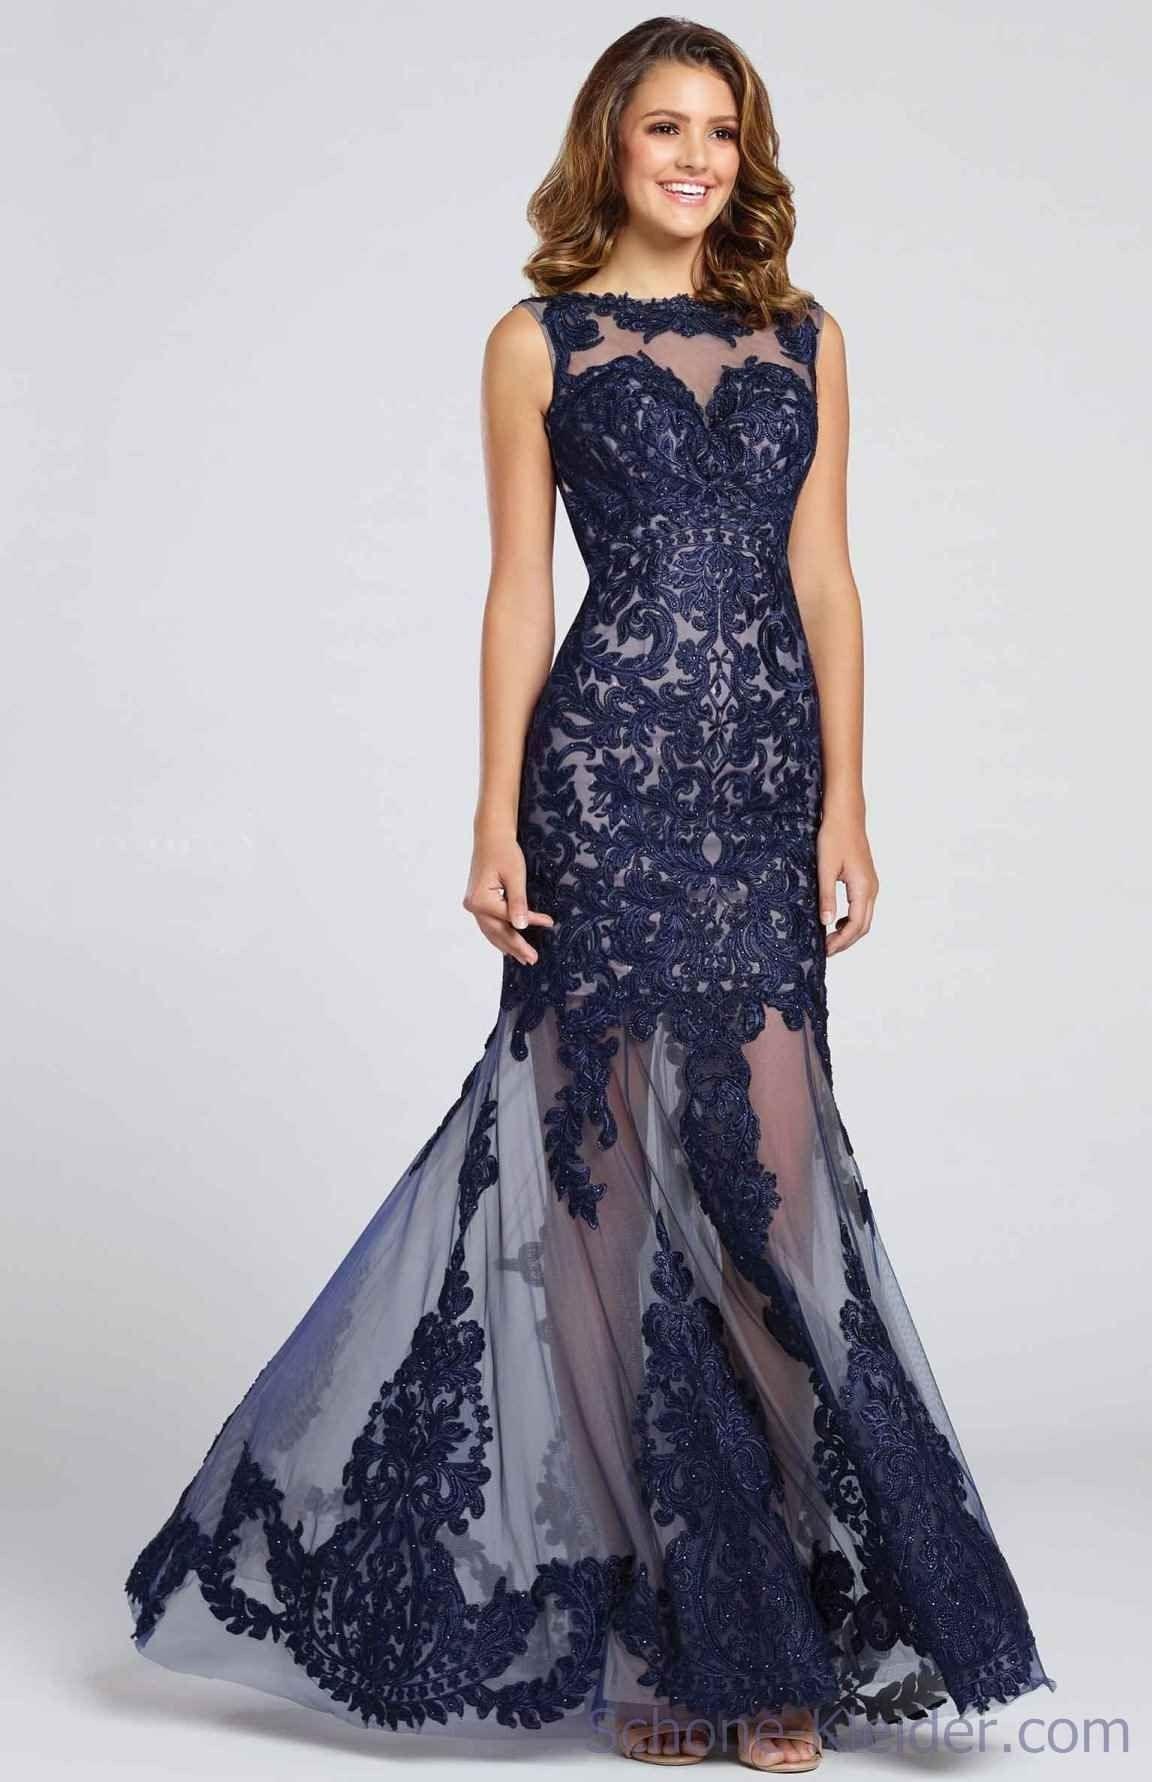 15 Cool Edle Abendkleider Bester Preis20 Spektakulär Edle Abendkleider Design